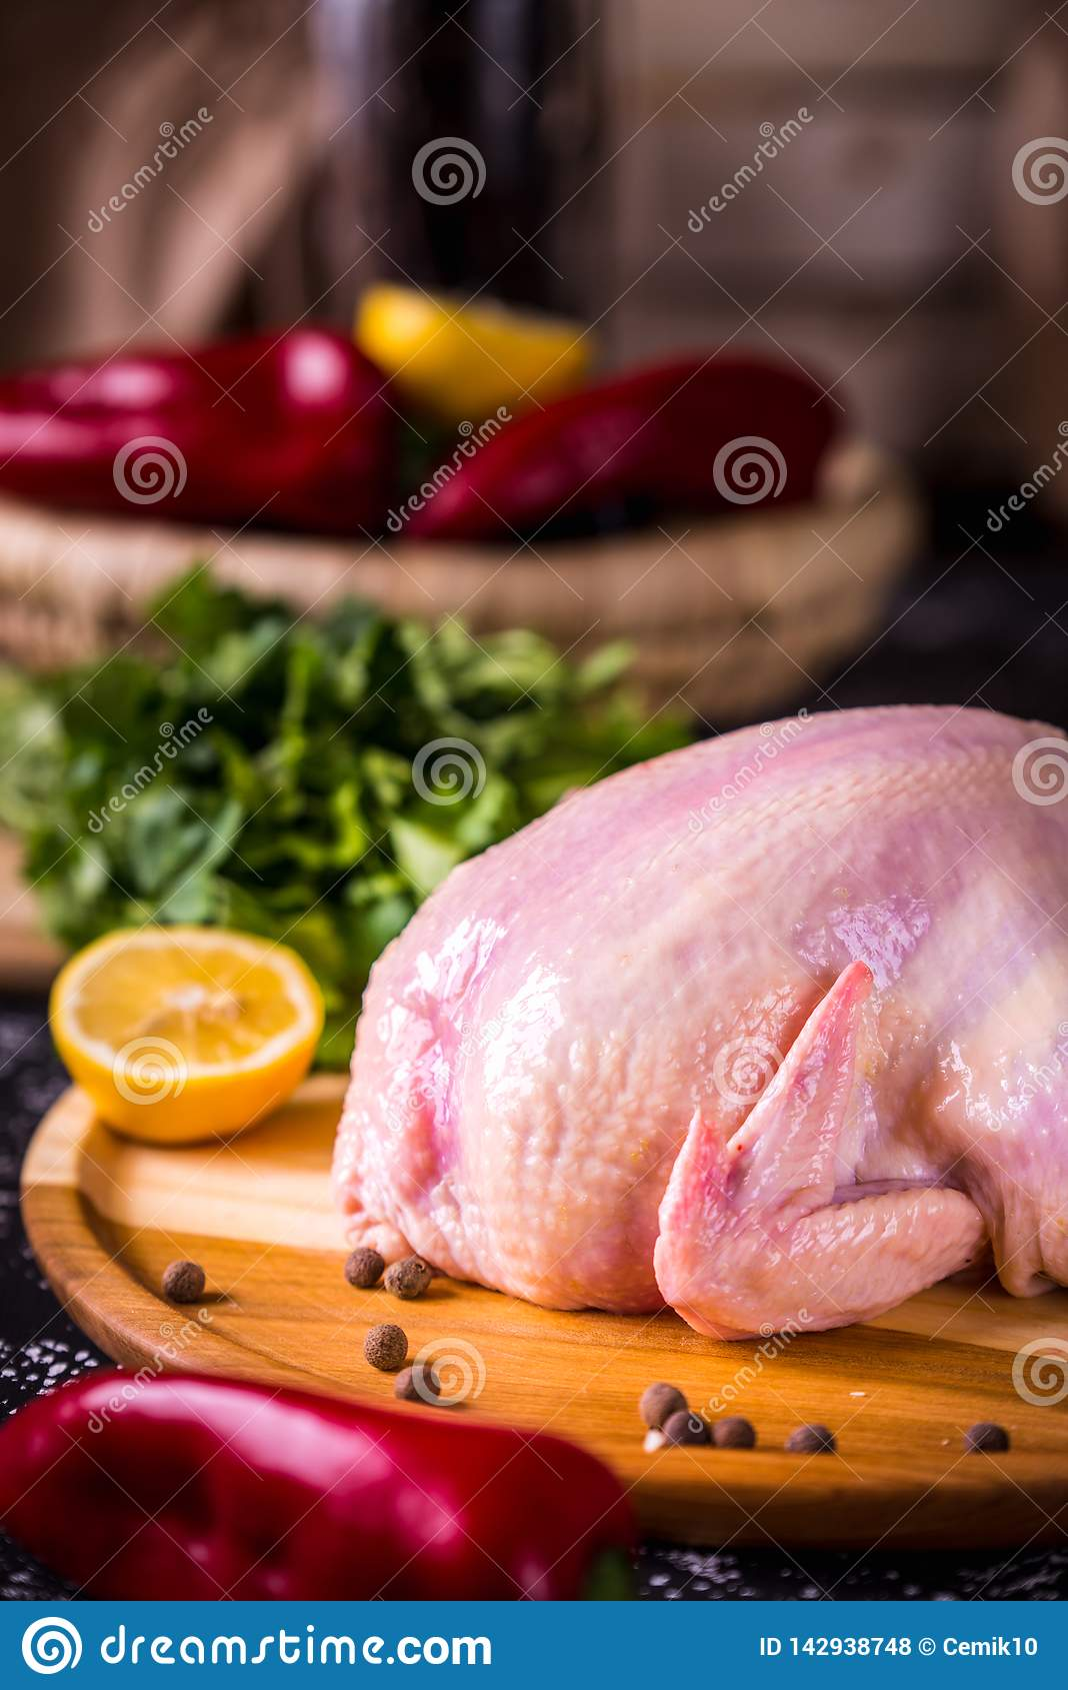 Gehele ruwe kip met roze peper en citroen